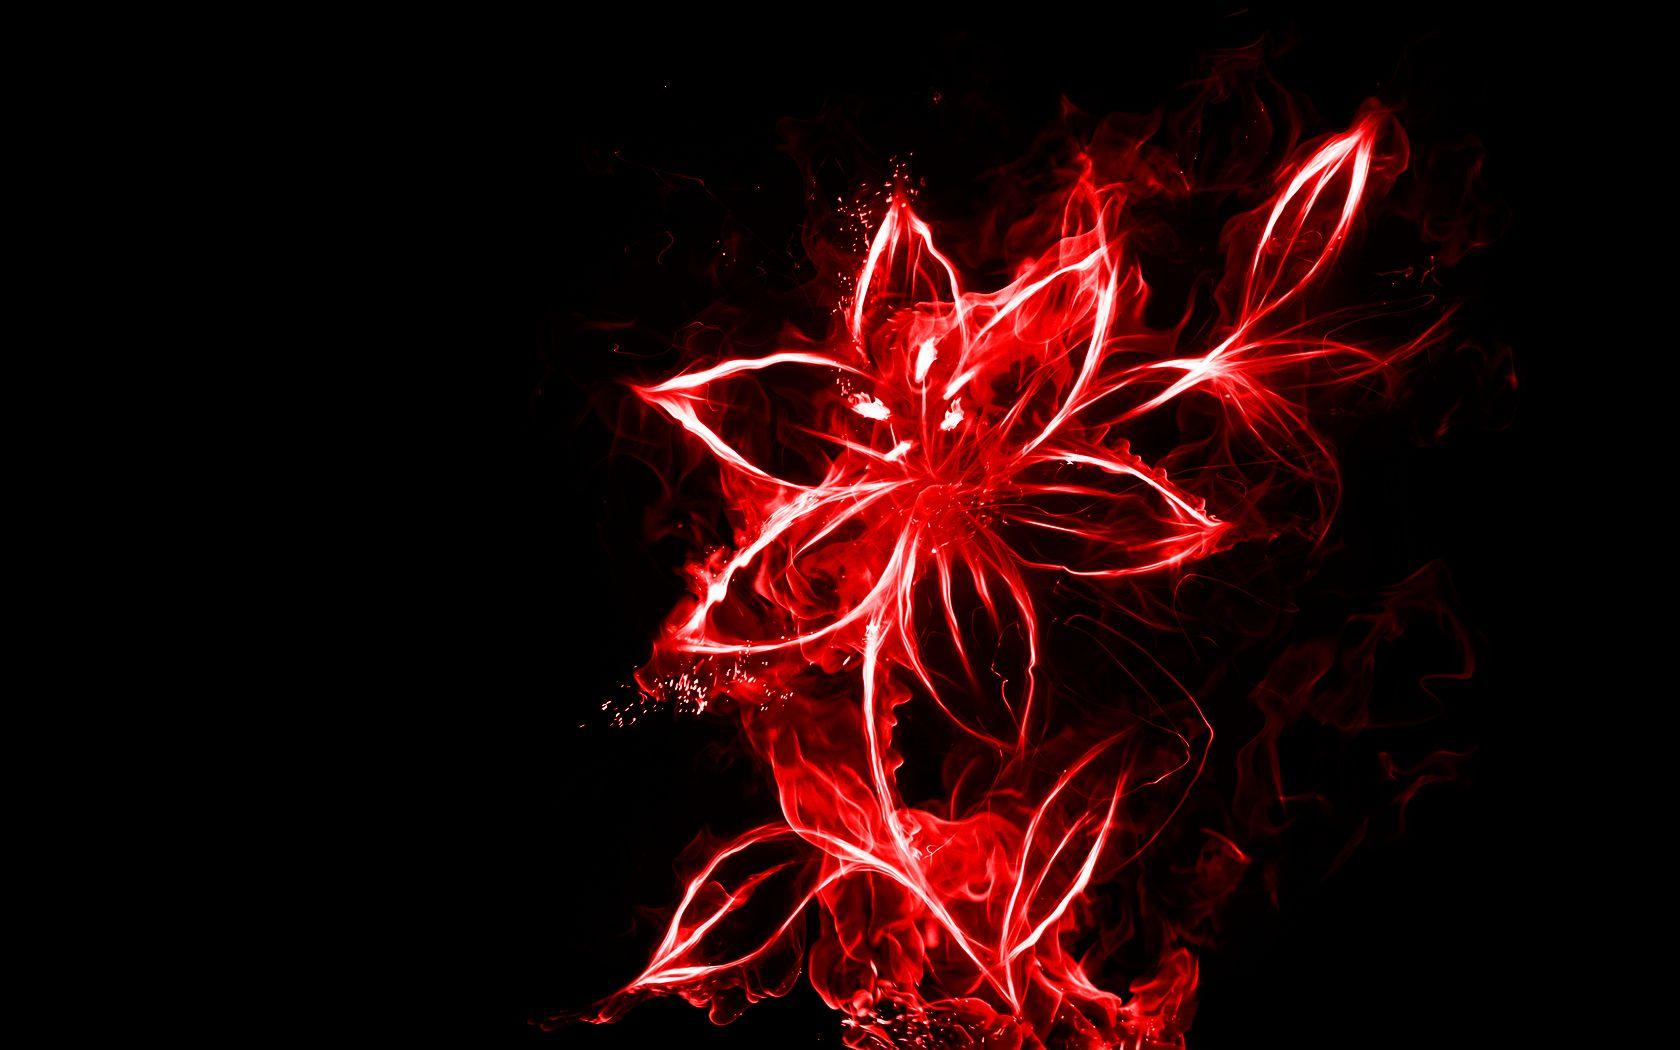 Red Fire Flower Neon Flowers Artistic Wallpaper Neon Wallpaper